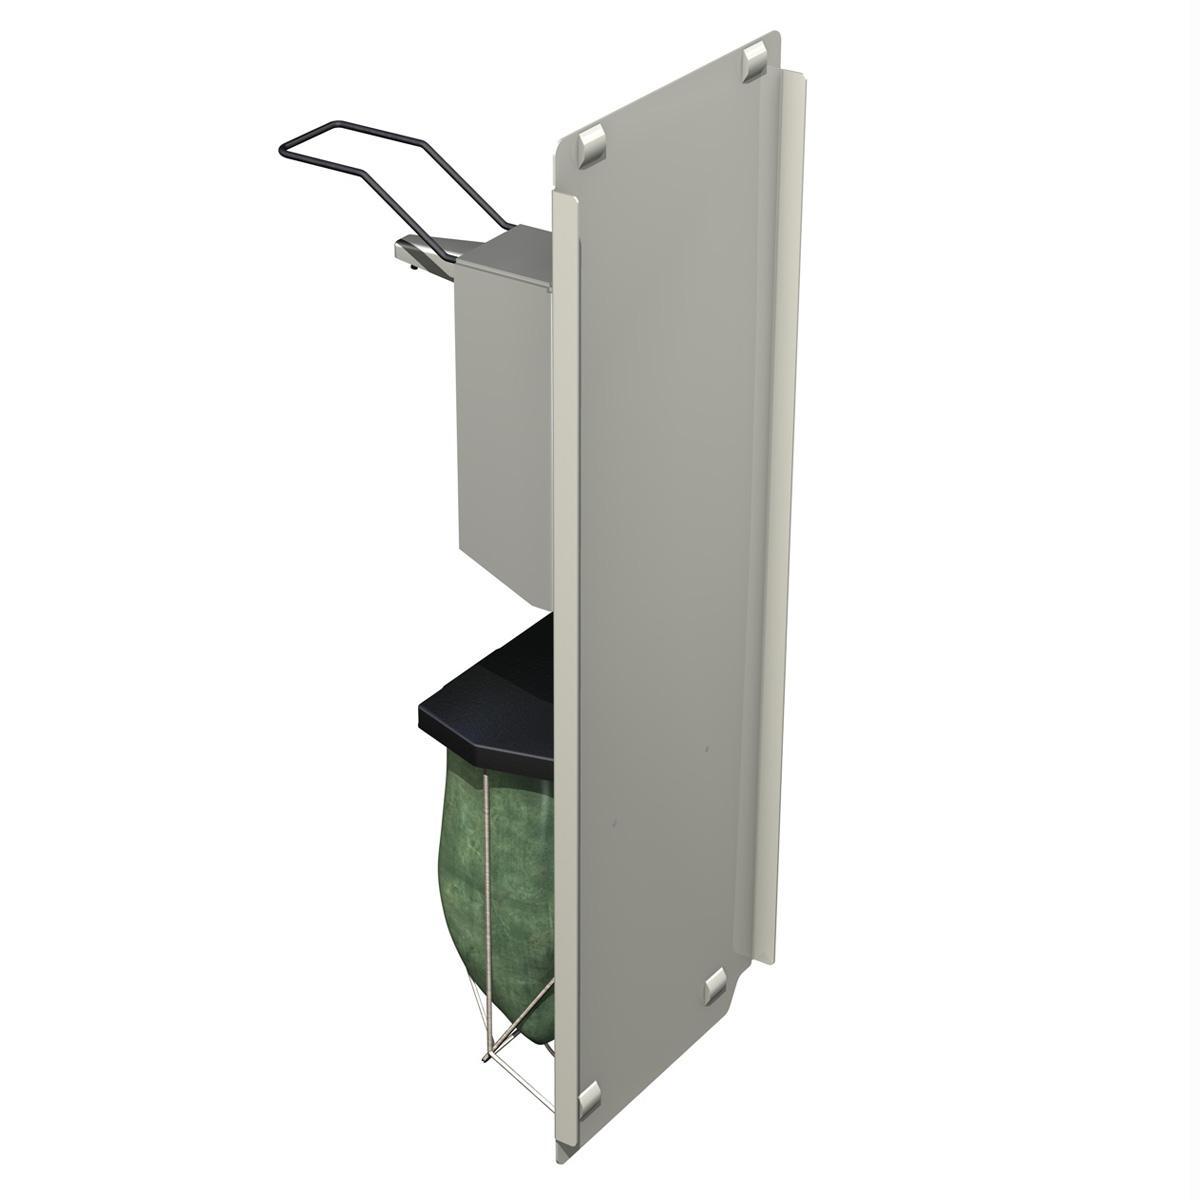 hand sanitizer station 3d model 3ds c4d lwo obj 264461